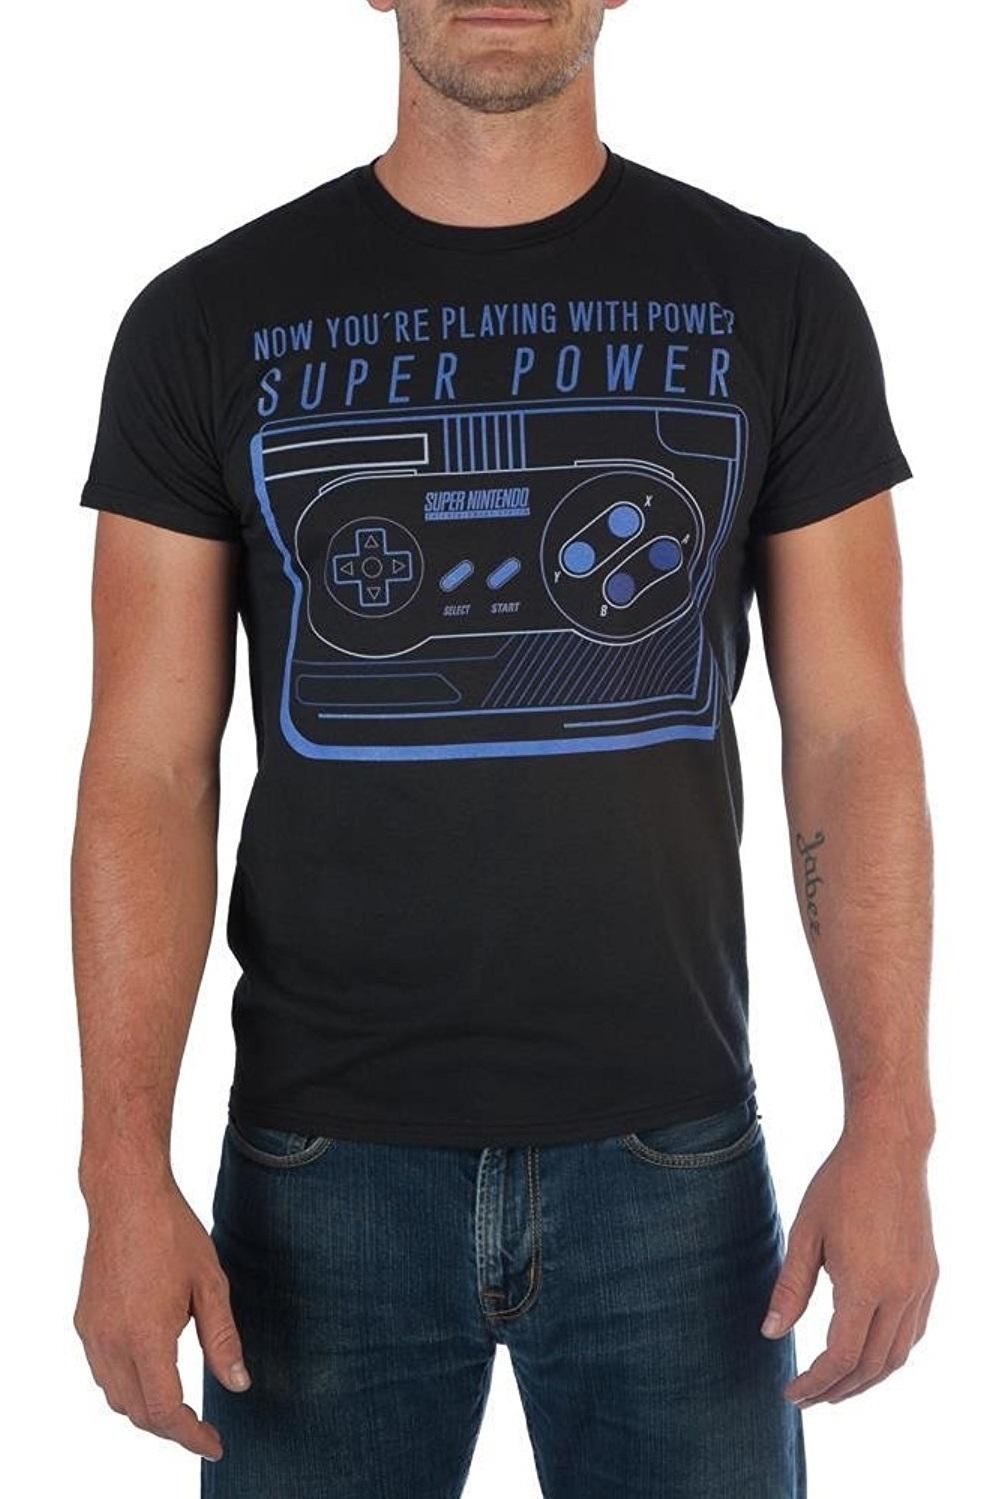 22c002820 Nintendo: SNES Controller Power - T-Shirt (Medium) image ...